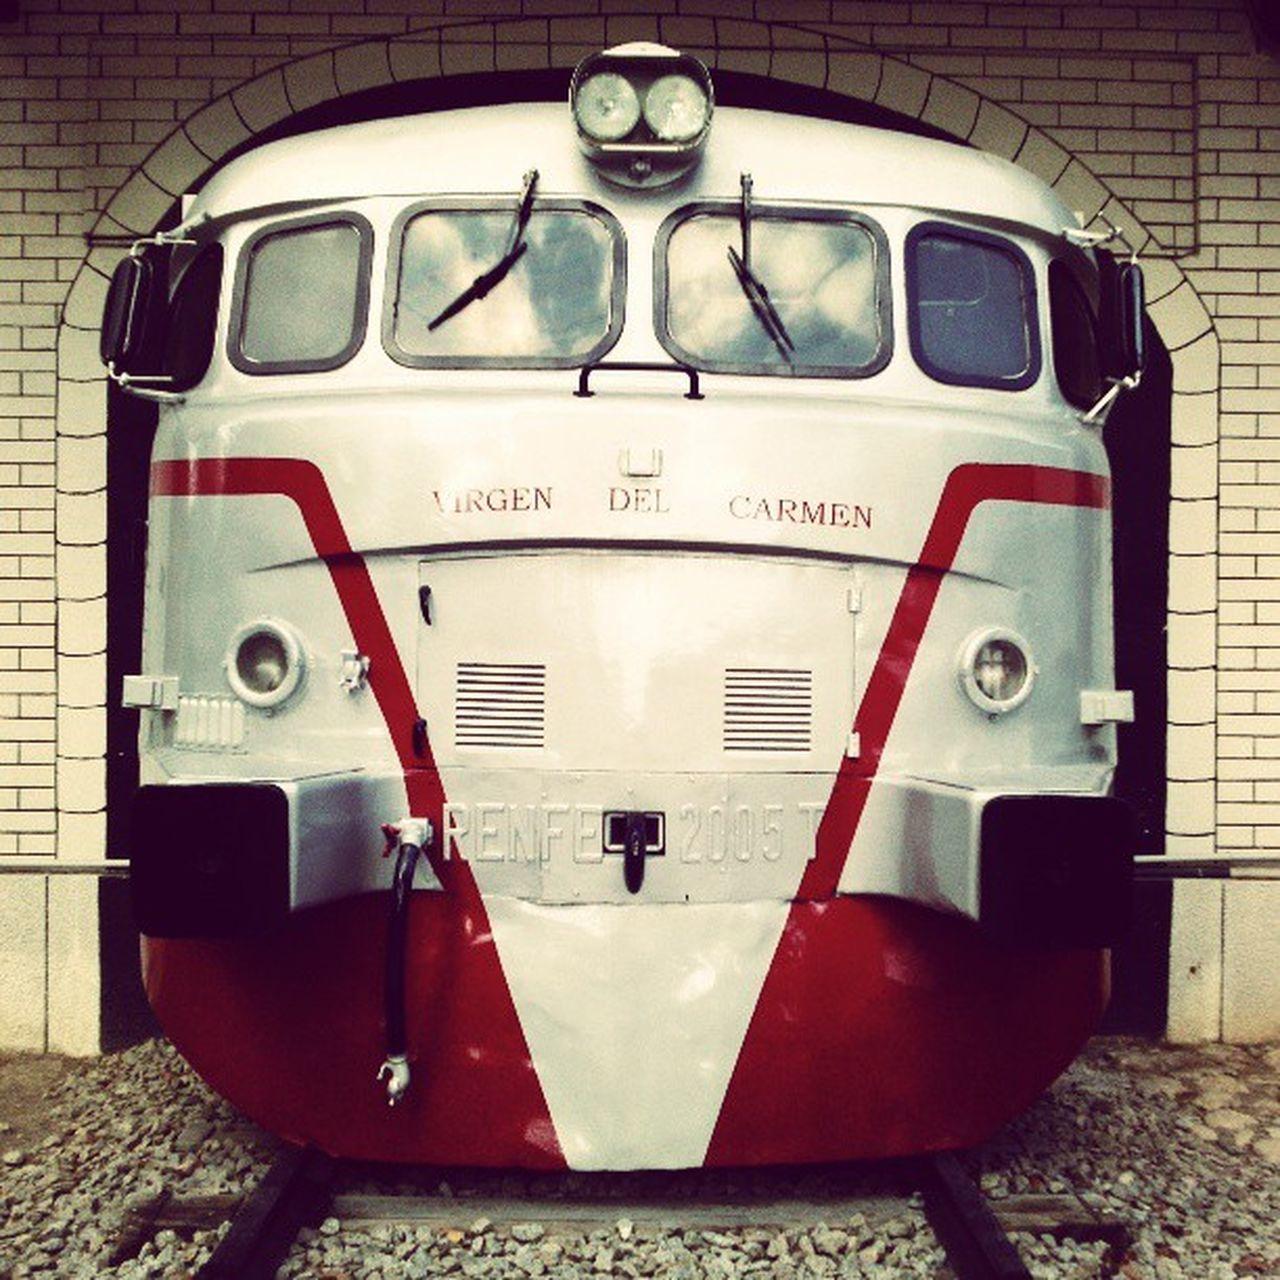 Museo del ferrocarril EstiualferrocarrilVNG Museo Ferrocarril Tren Museum Train Vilanovailageltru